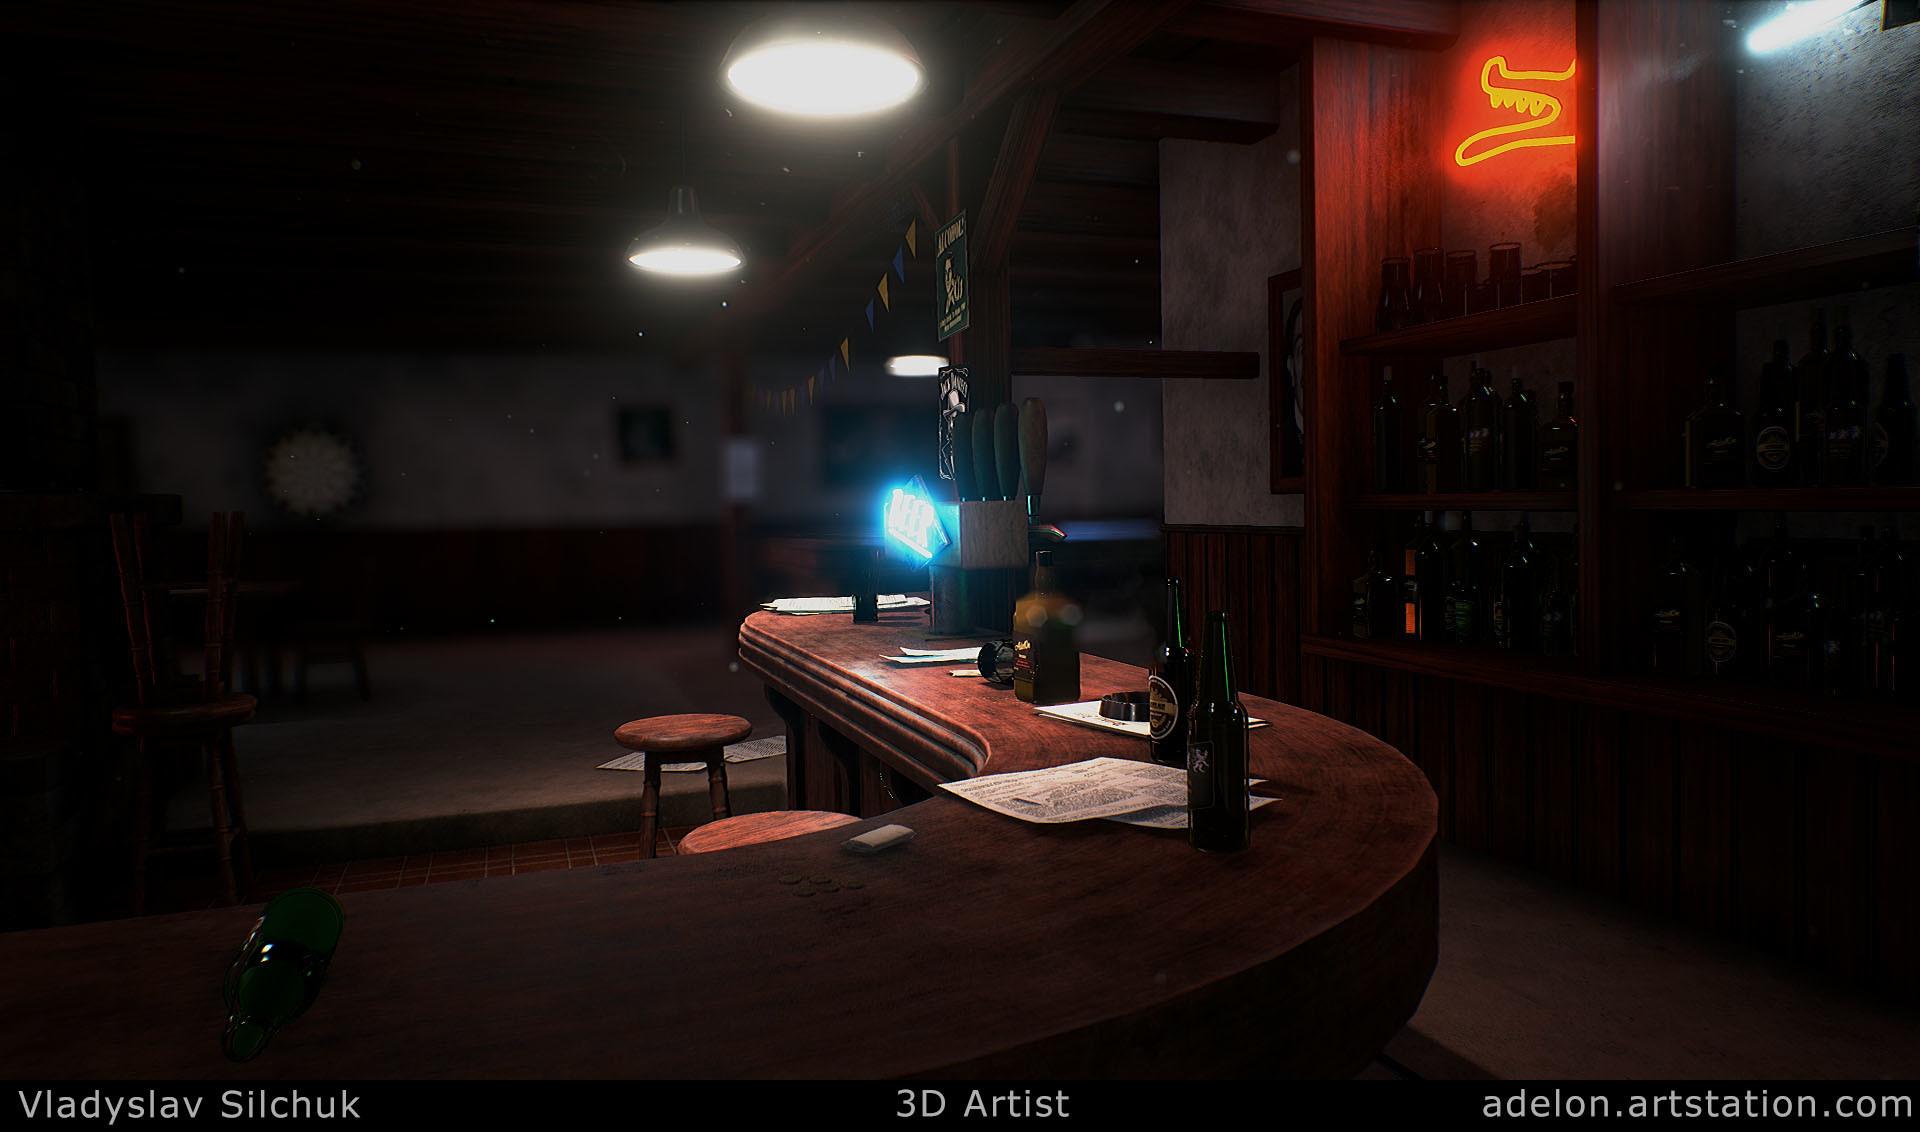 Vladyslav silchuk old pub 2 adelon